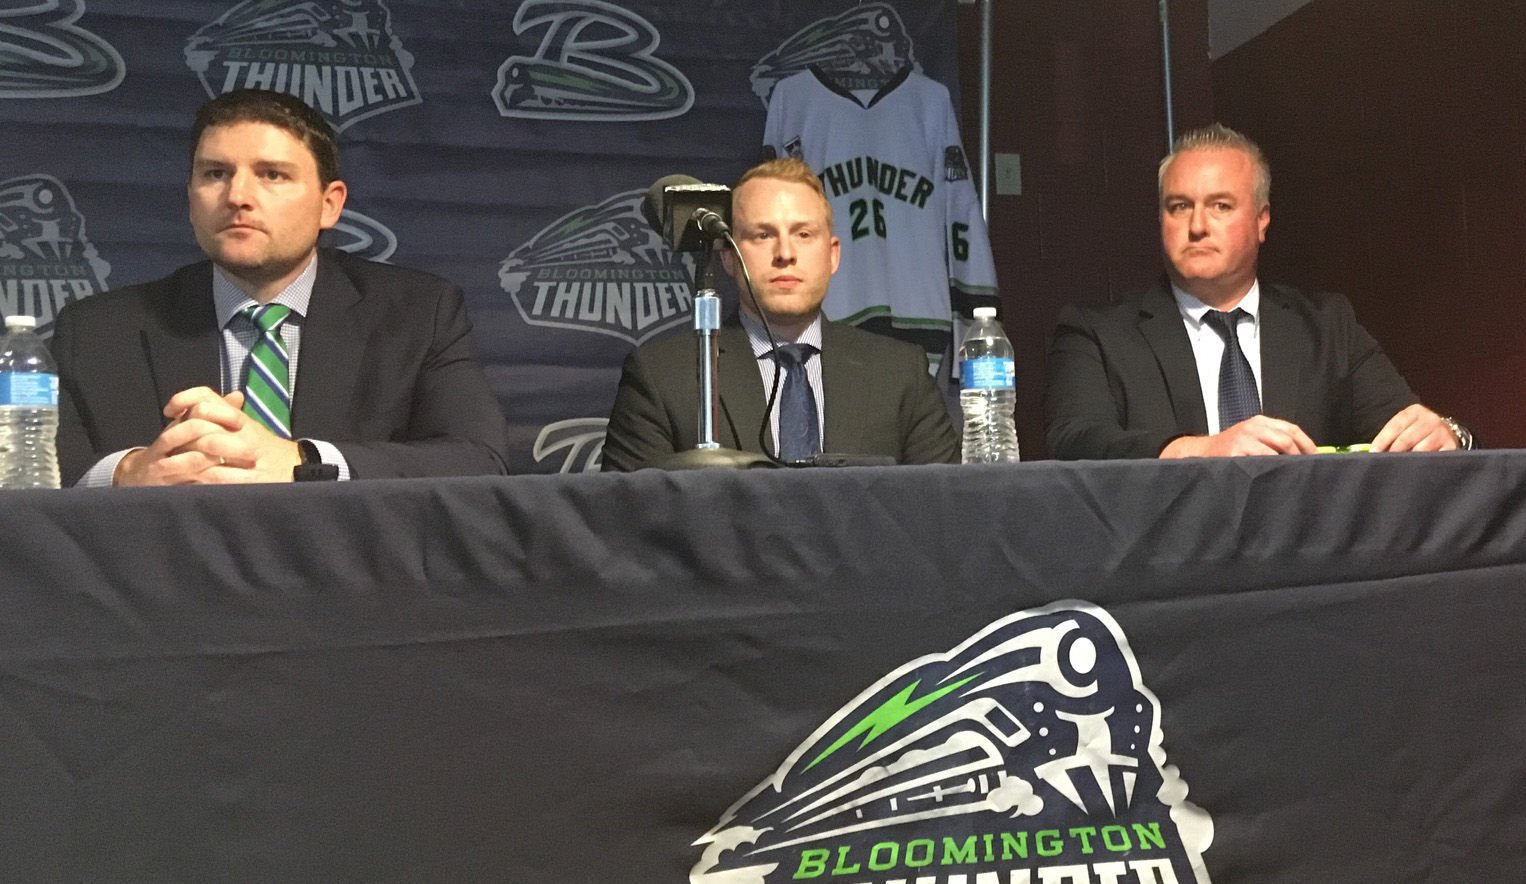 USHL: Watt, Jewell Embrace New Roles As Thunder Leaders